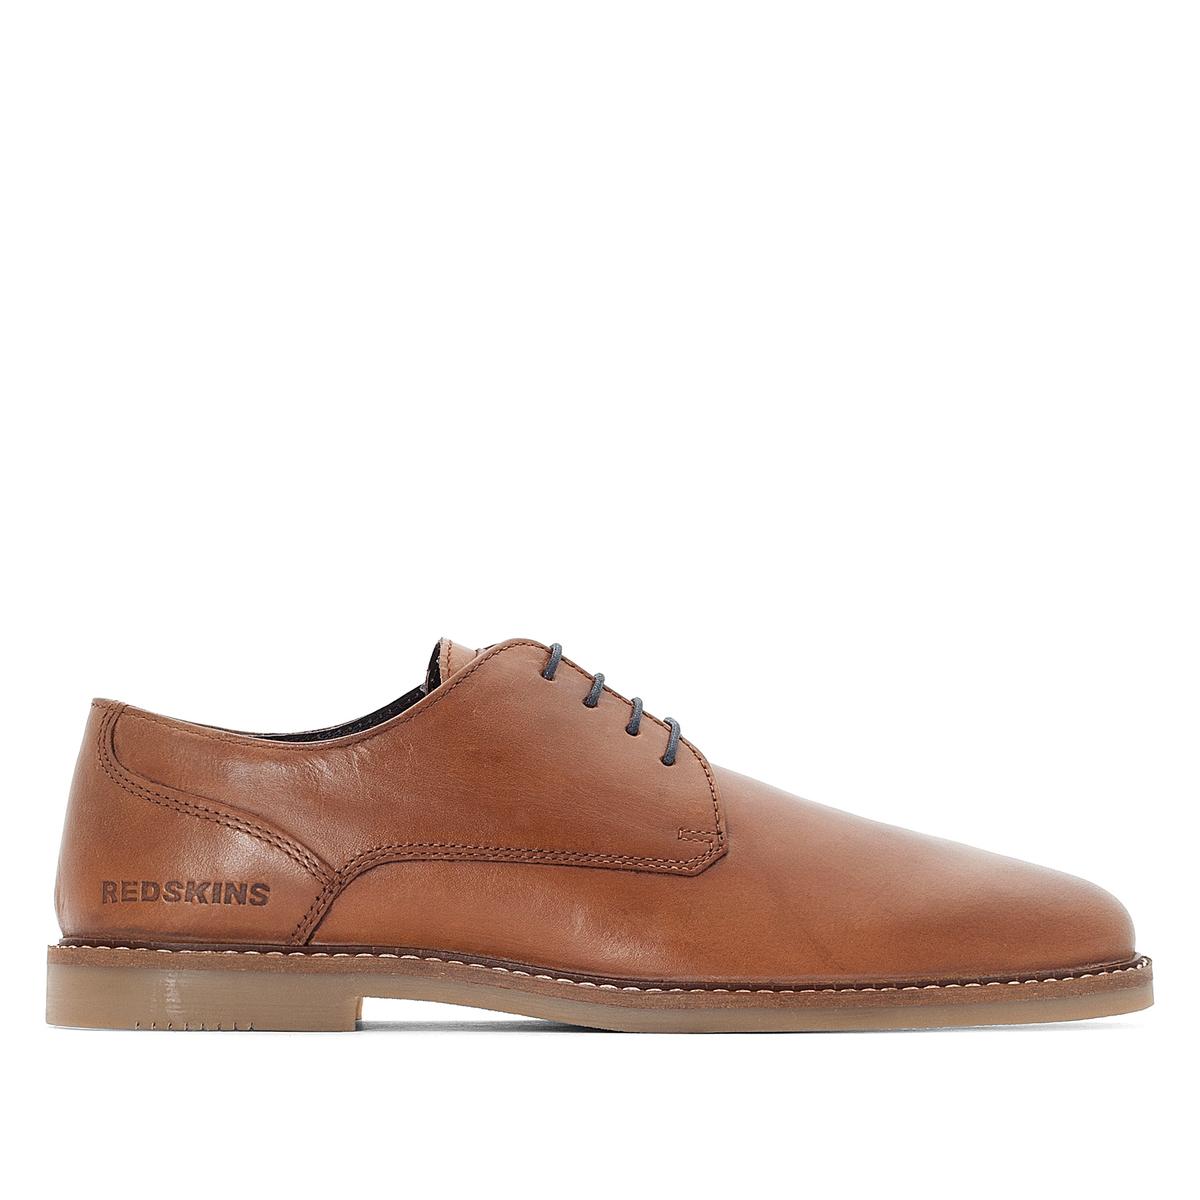 Ботинки-дерби кожаные Wandor ботинки дерби из мягкой кожи takarika